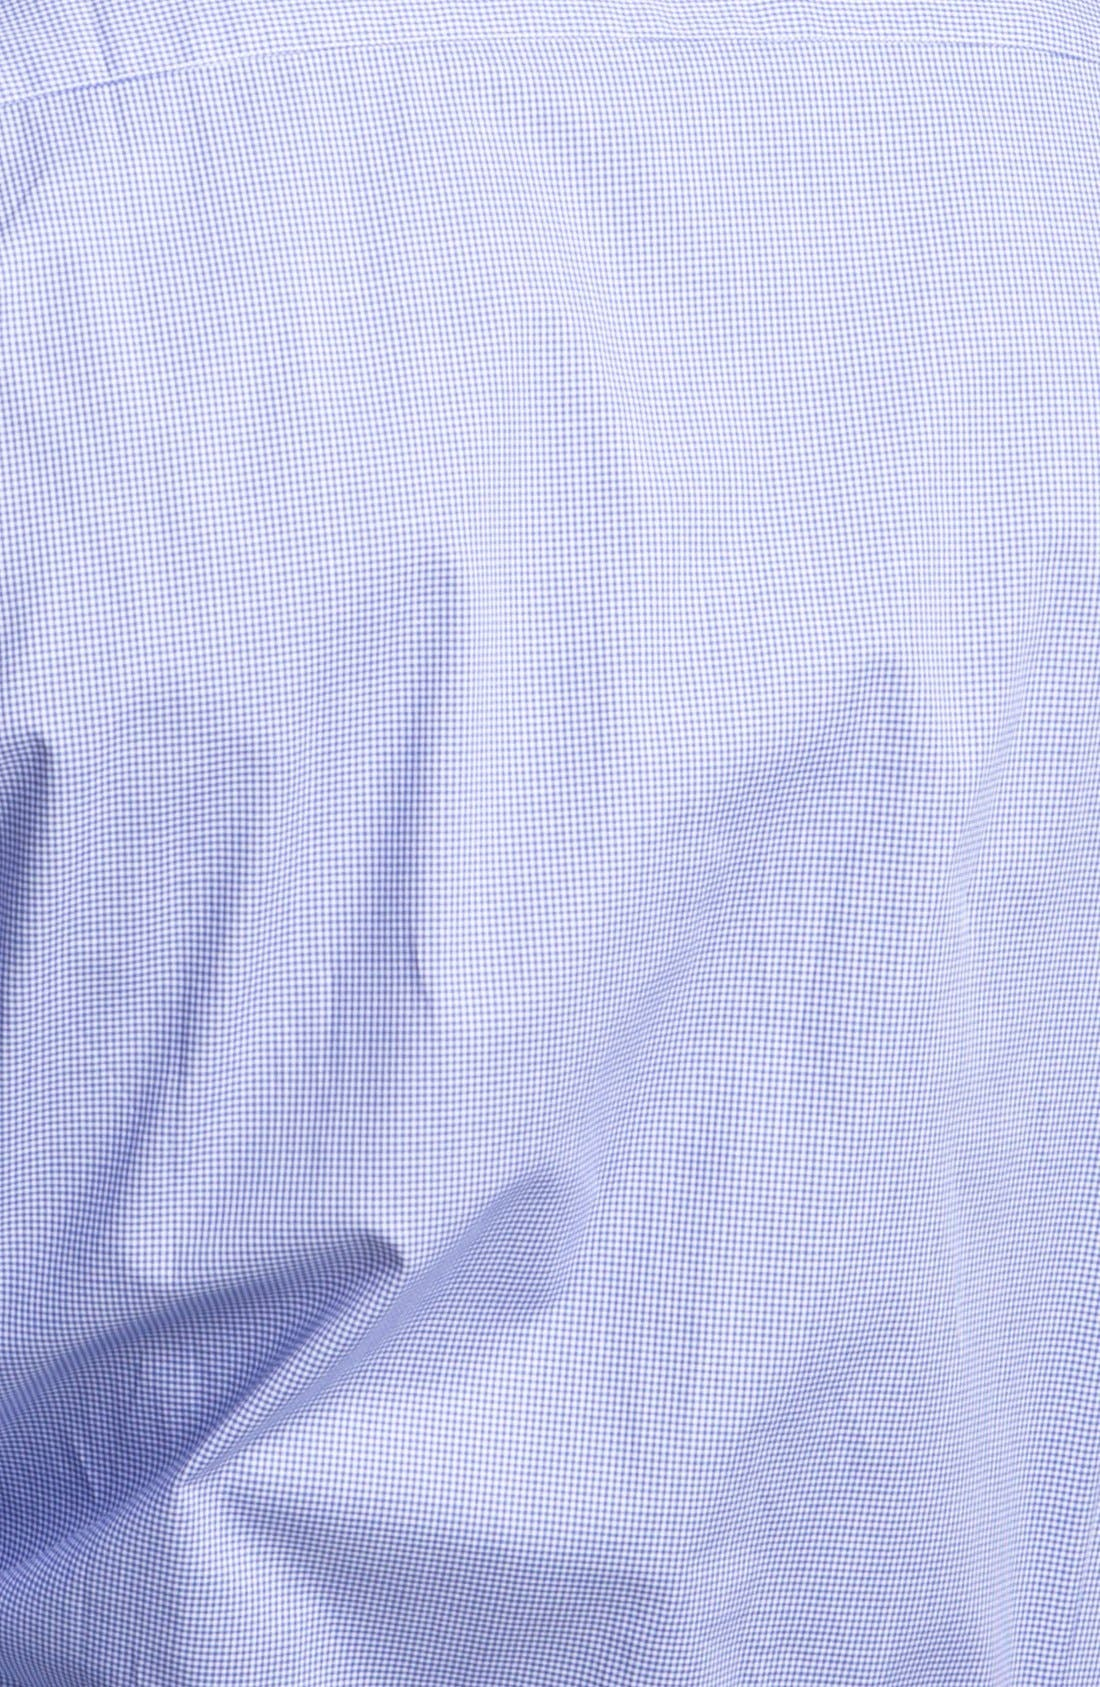 Alternate Image 3  - Paul Smith London Slim Fit Microcheck Dress Shirt